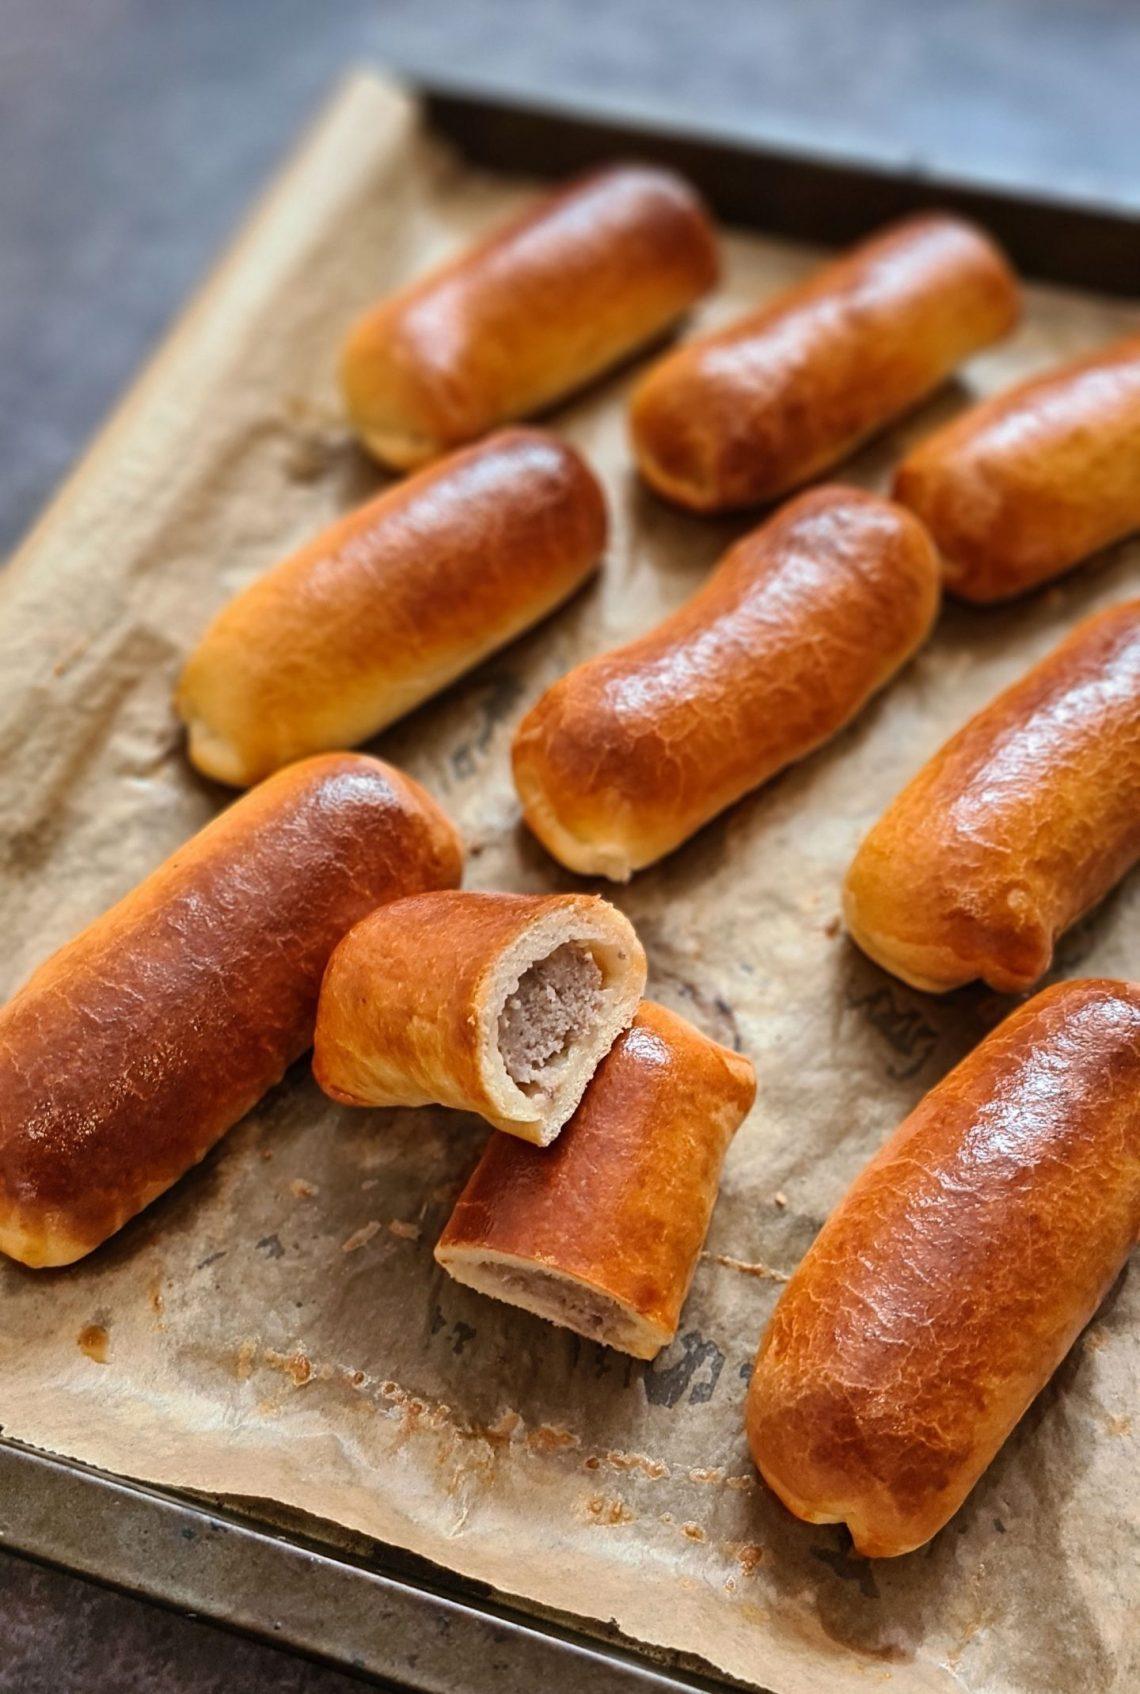 Worstenbroodjes Dutch Sauasage Rolls